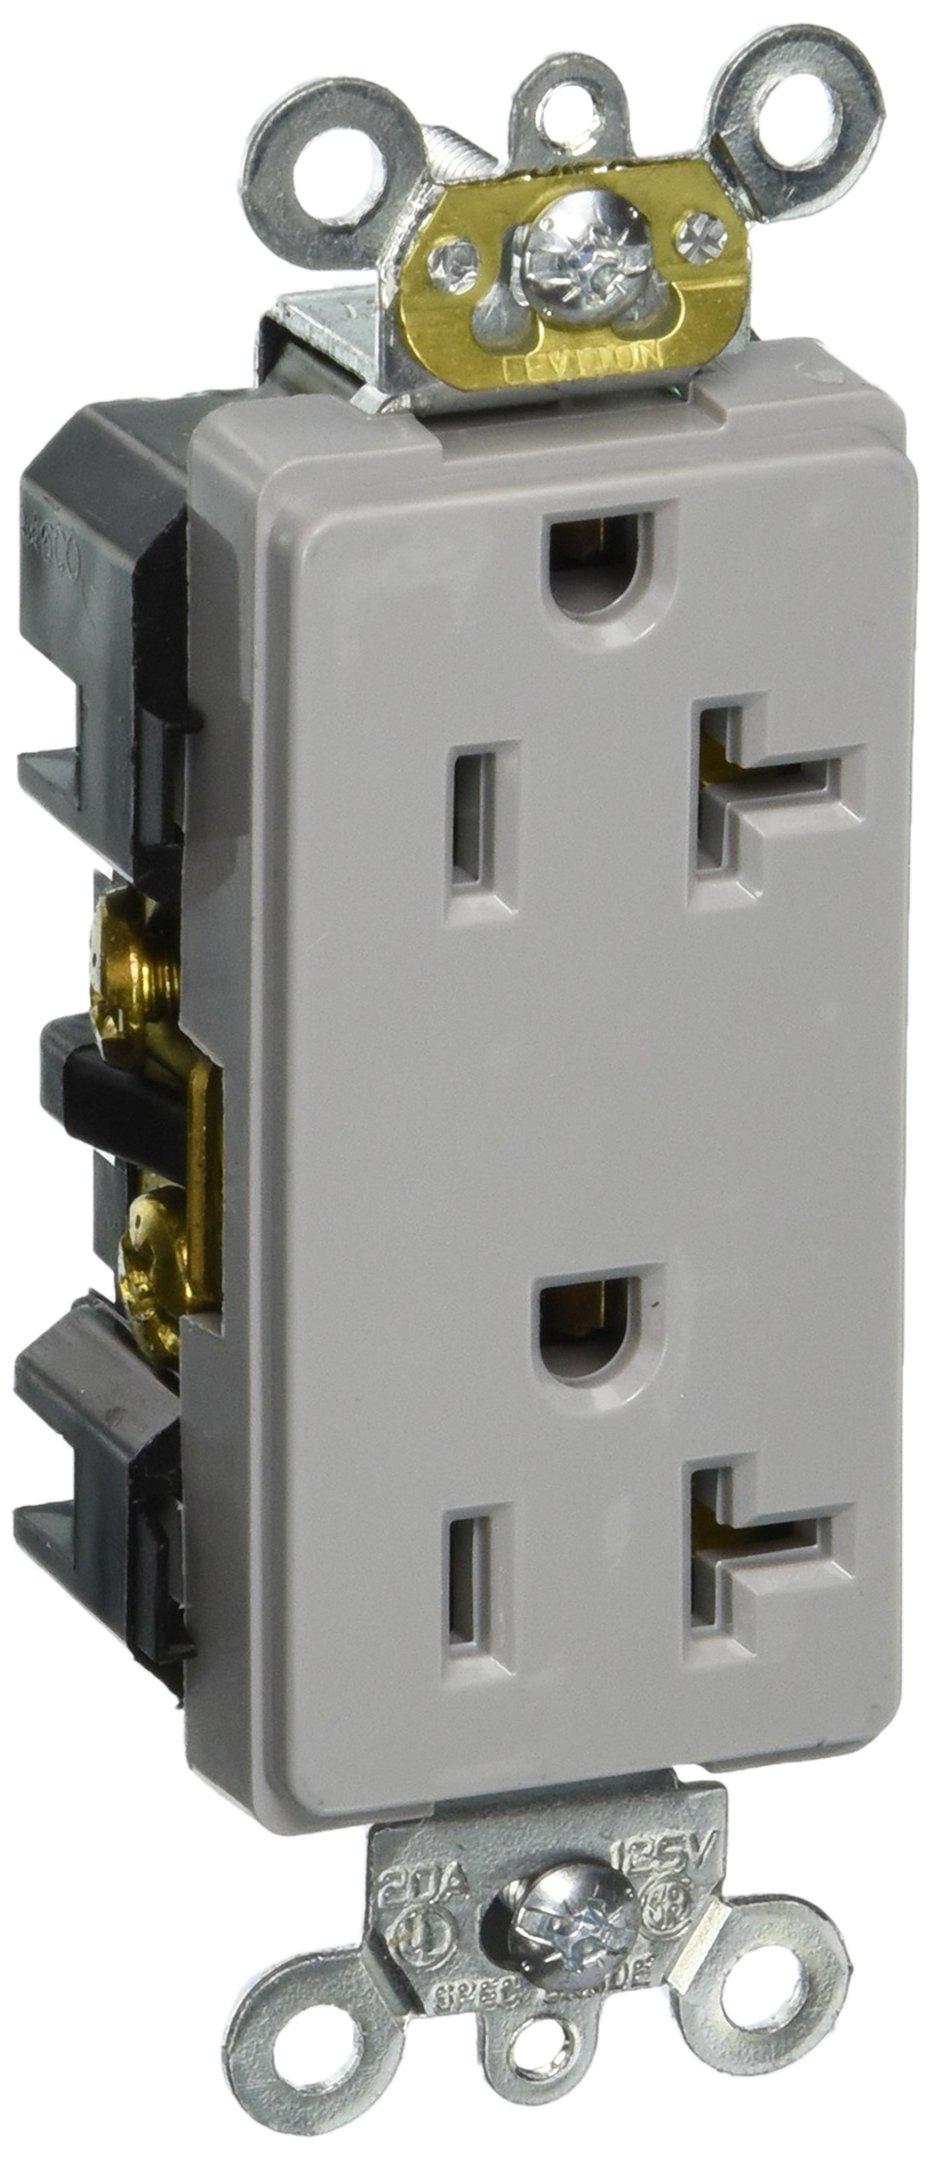 Leviton 16362-GY 20-Amp, 125-Volt, Decora Plus Duplex Receptacle, Straight Blade, Industrial Grade, Self Grounding, Gray